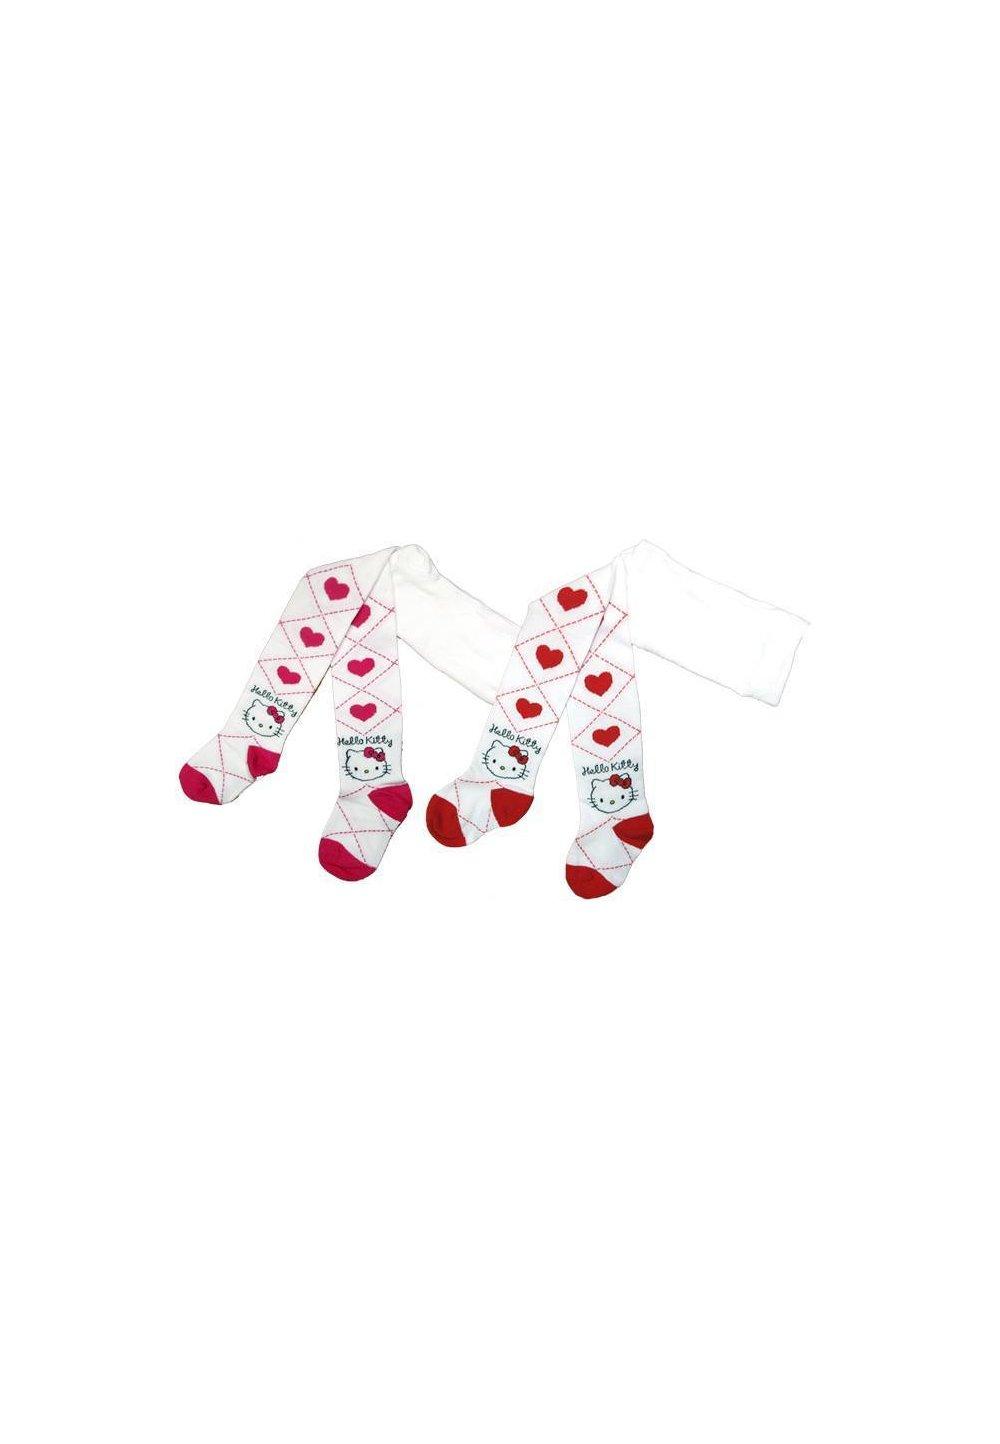 Ciorapi cu chilot HK 2991 imagine